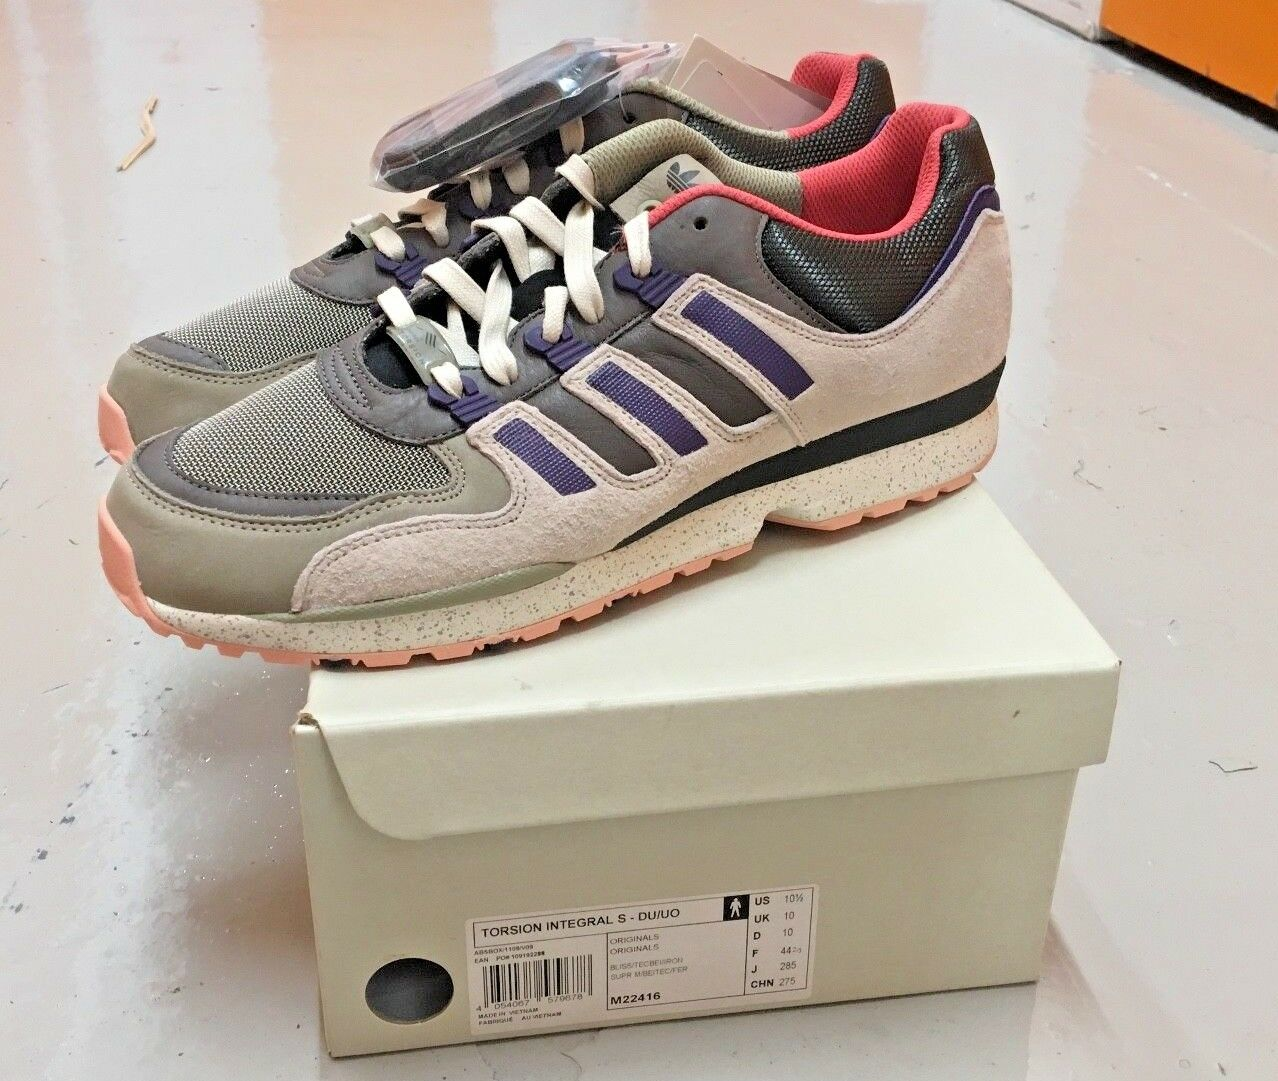 Selten Adidas Torsion Integral S Sneaker Qs Us 10.5 UK 10 Konsortium Fieg